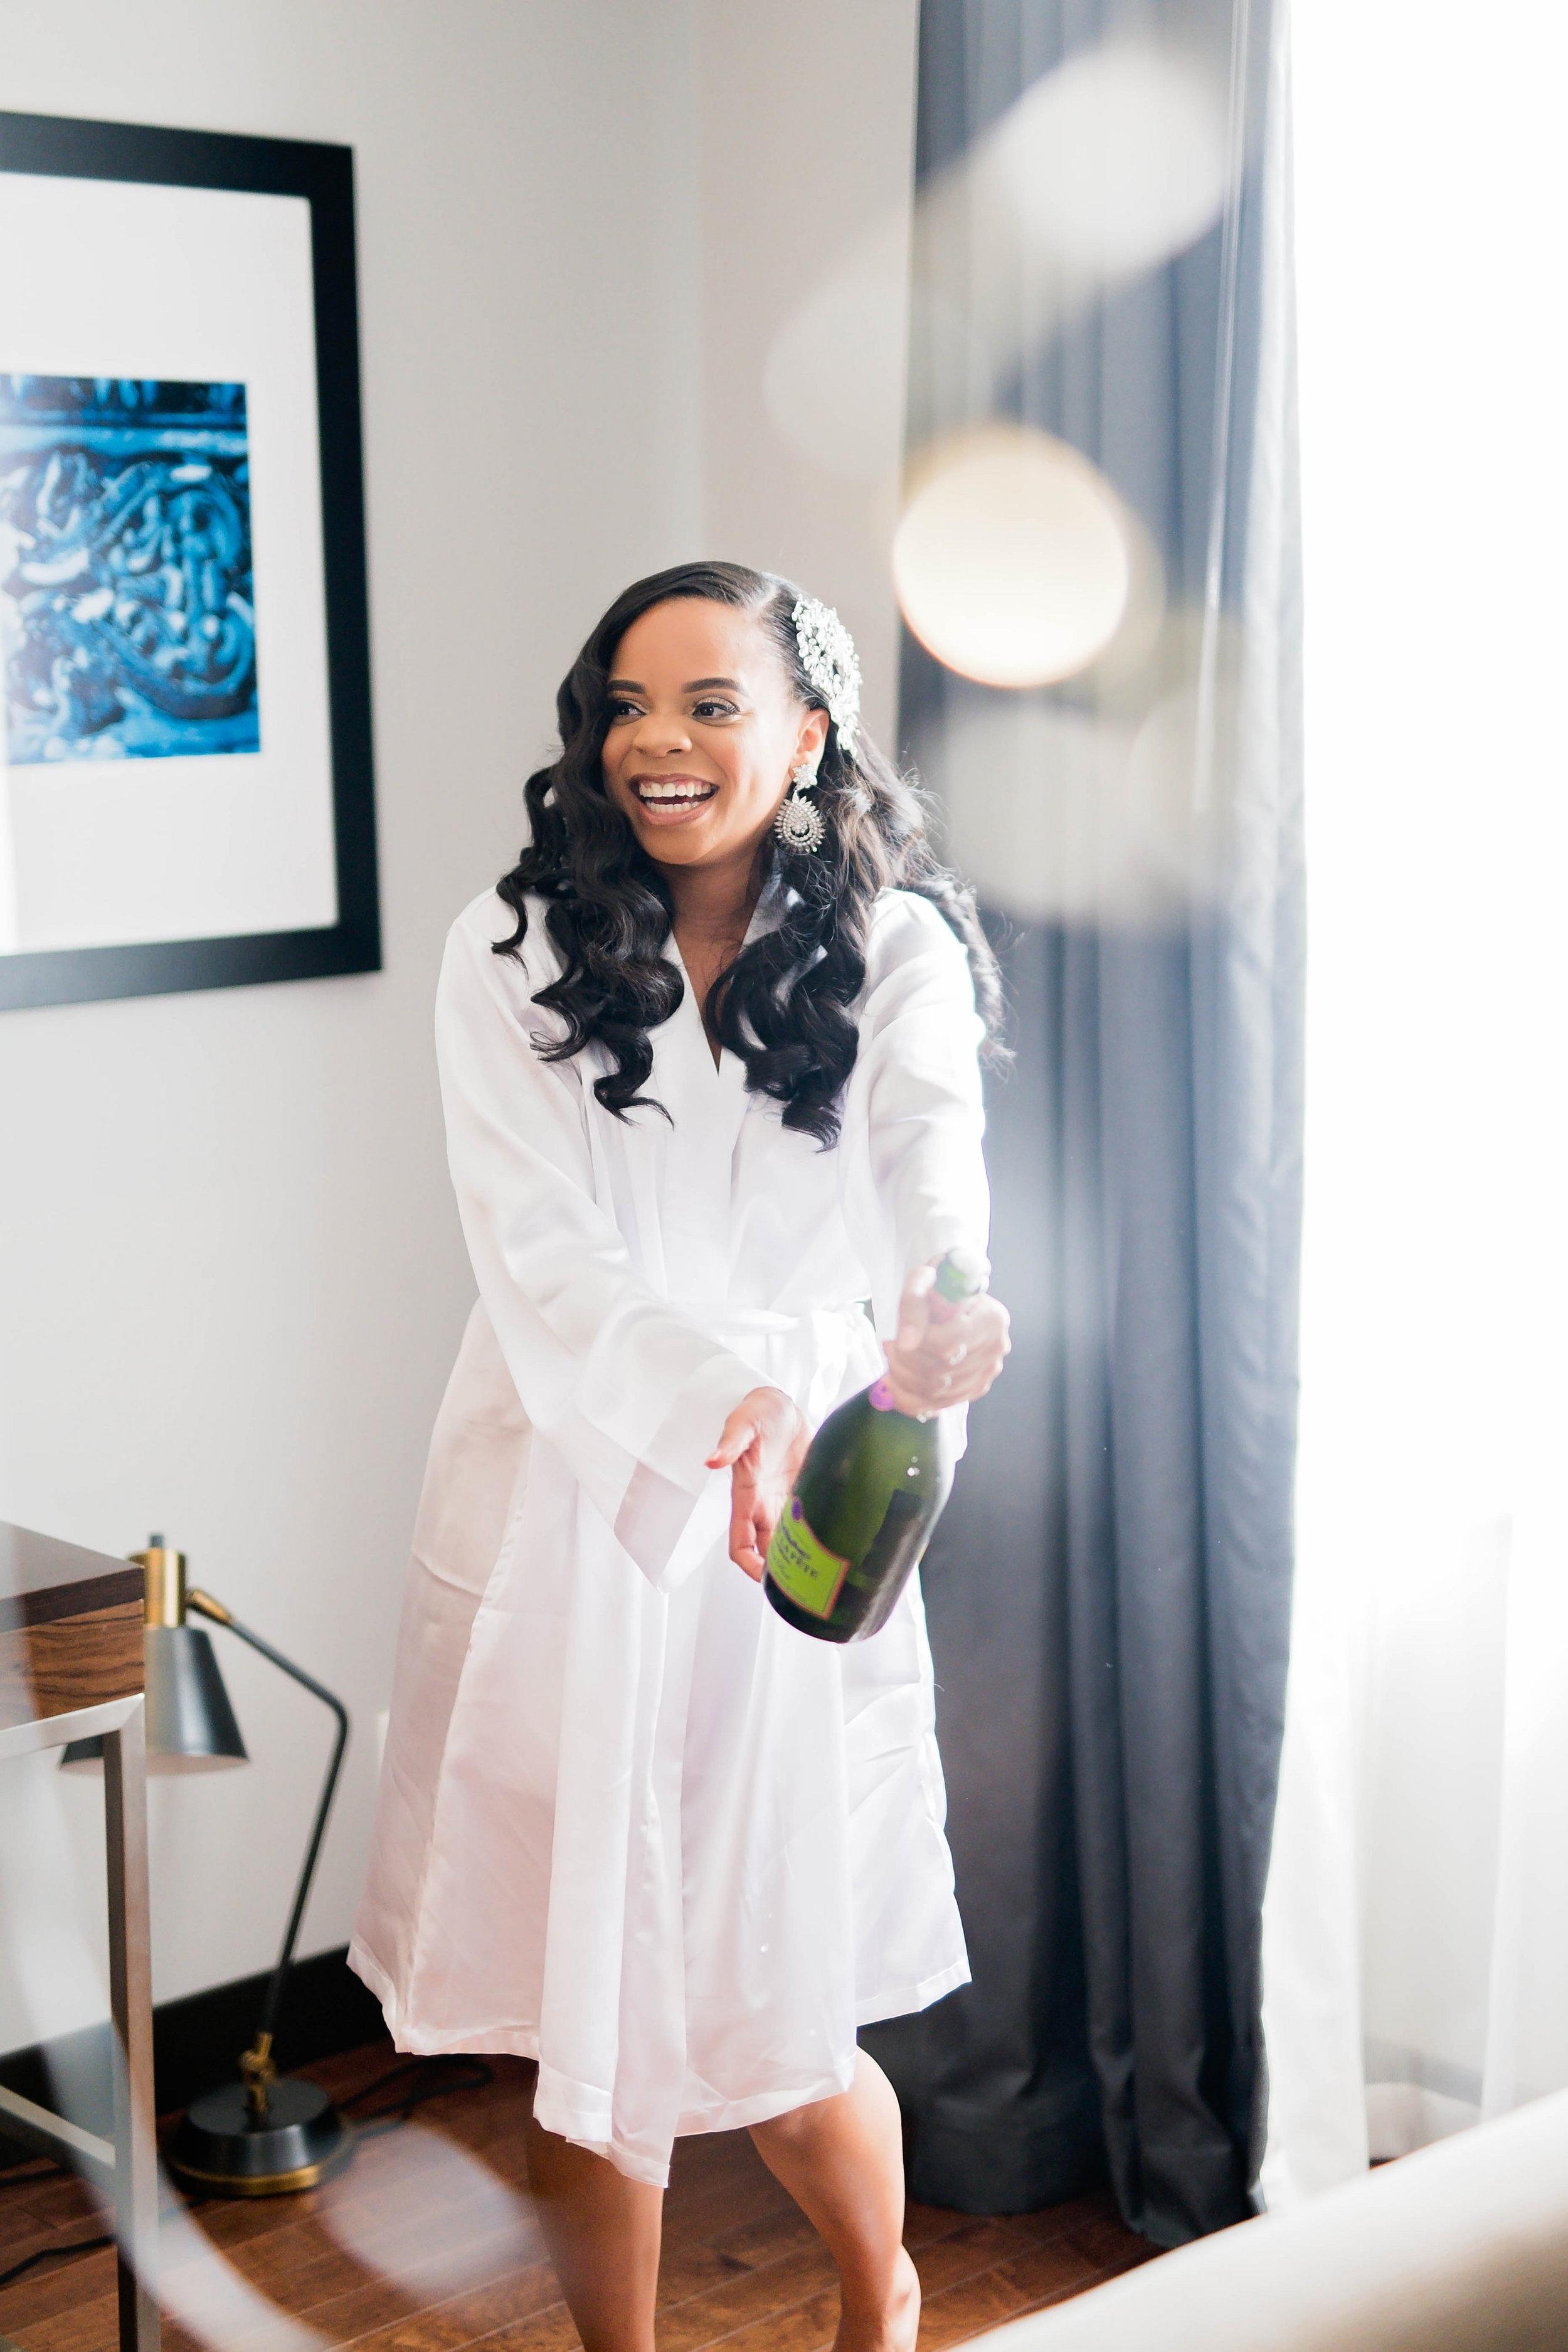 Tulsa Wedding- Pharris Photography- Getting Ready- Darla + Quinton -Bride- Pop Champagne